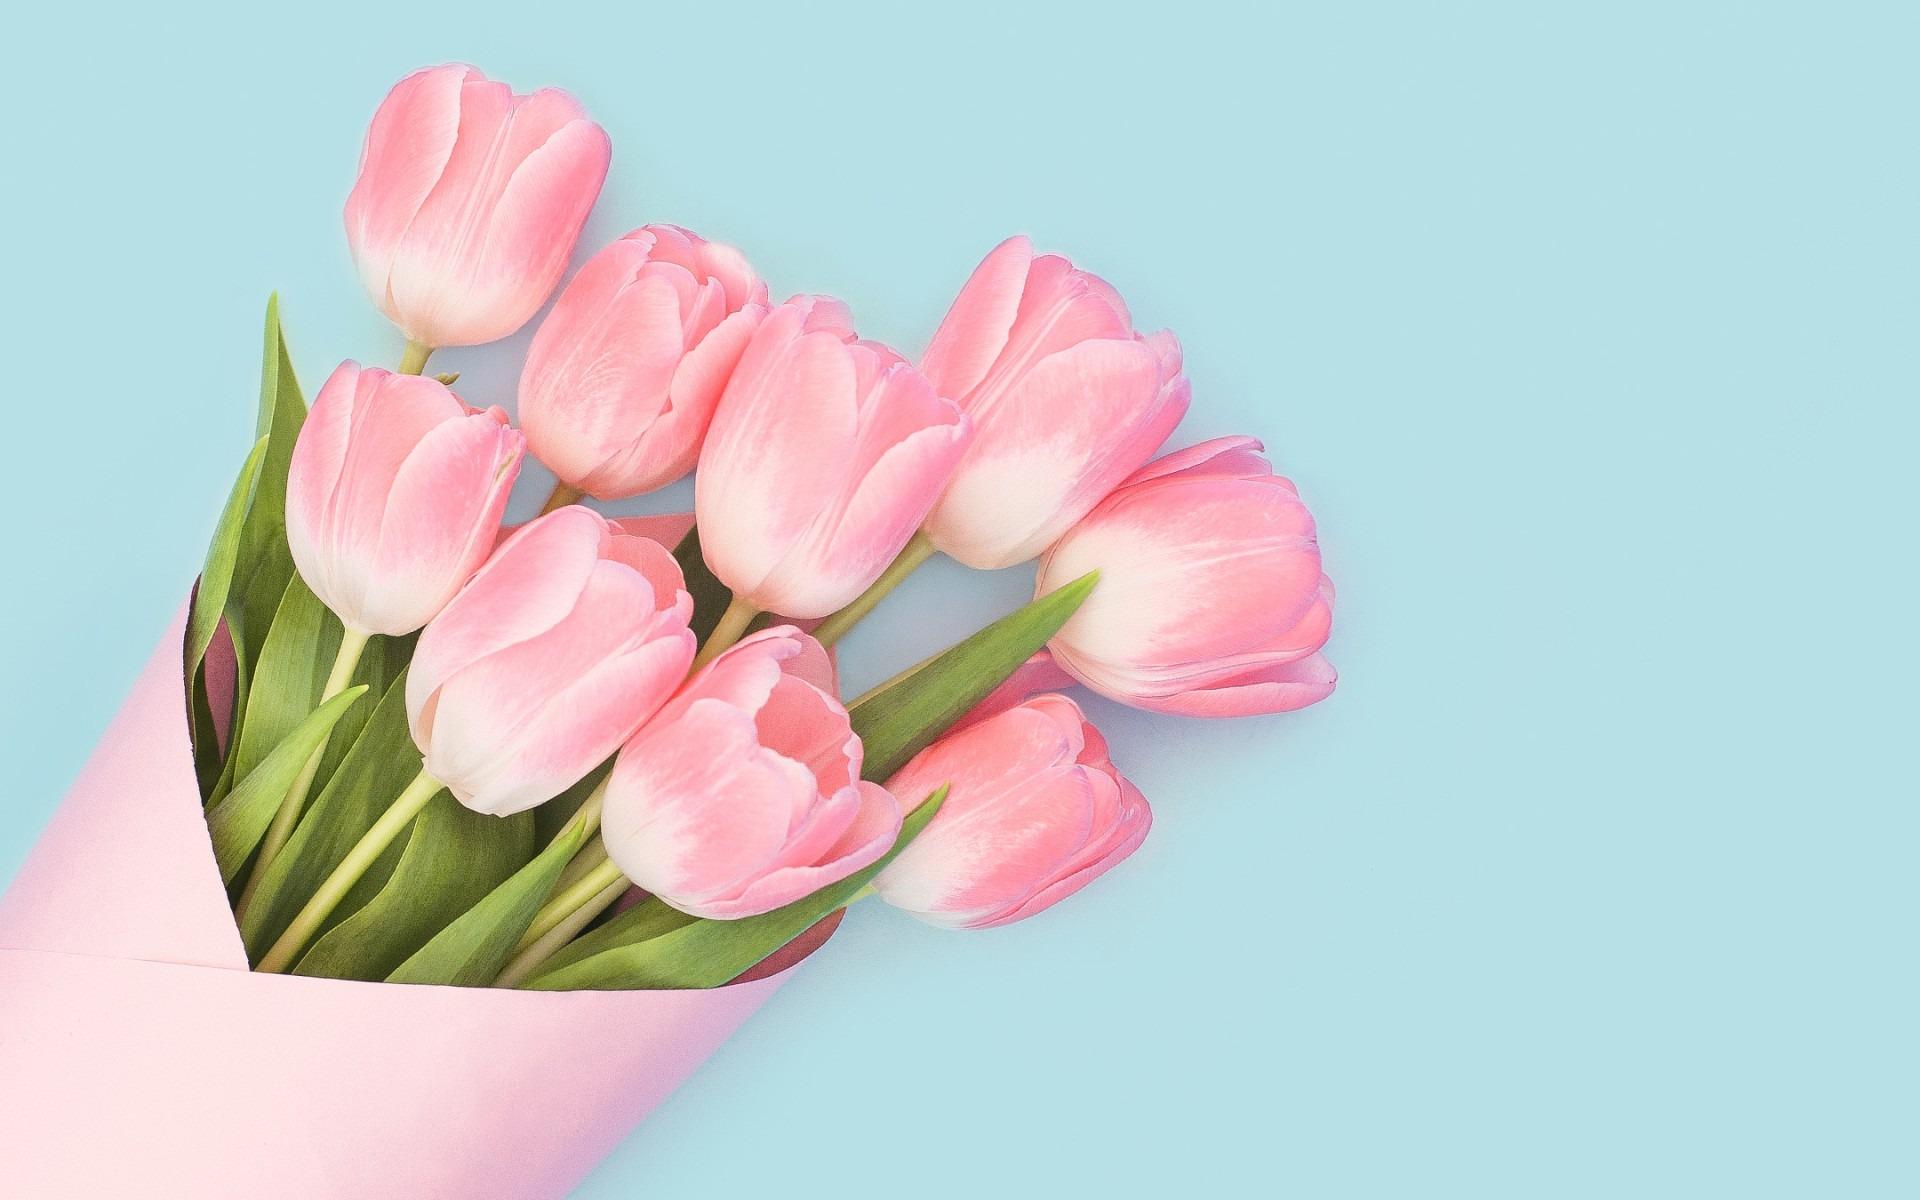 ảnh nền hoa tulip đẹp